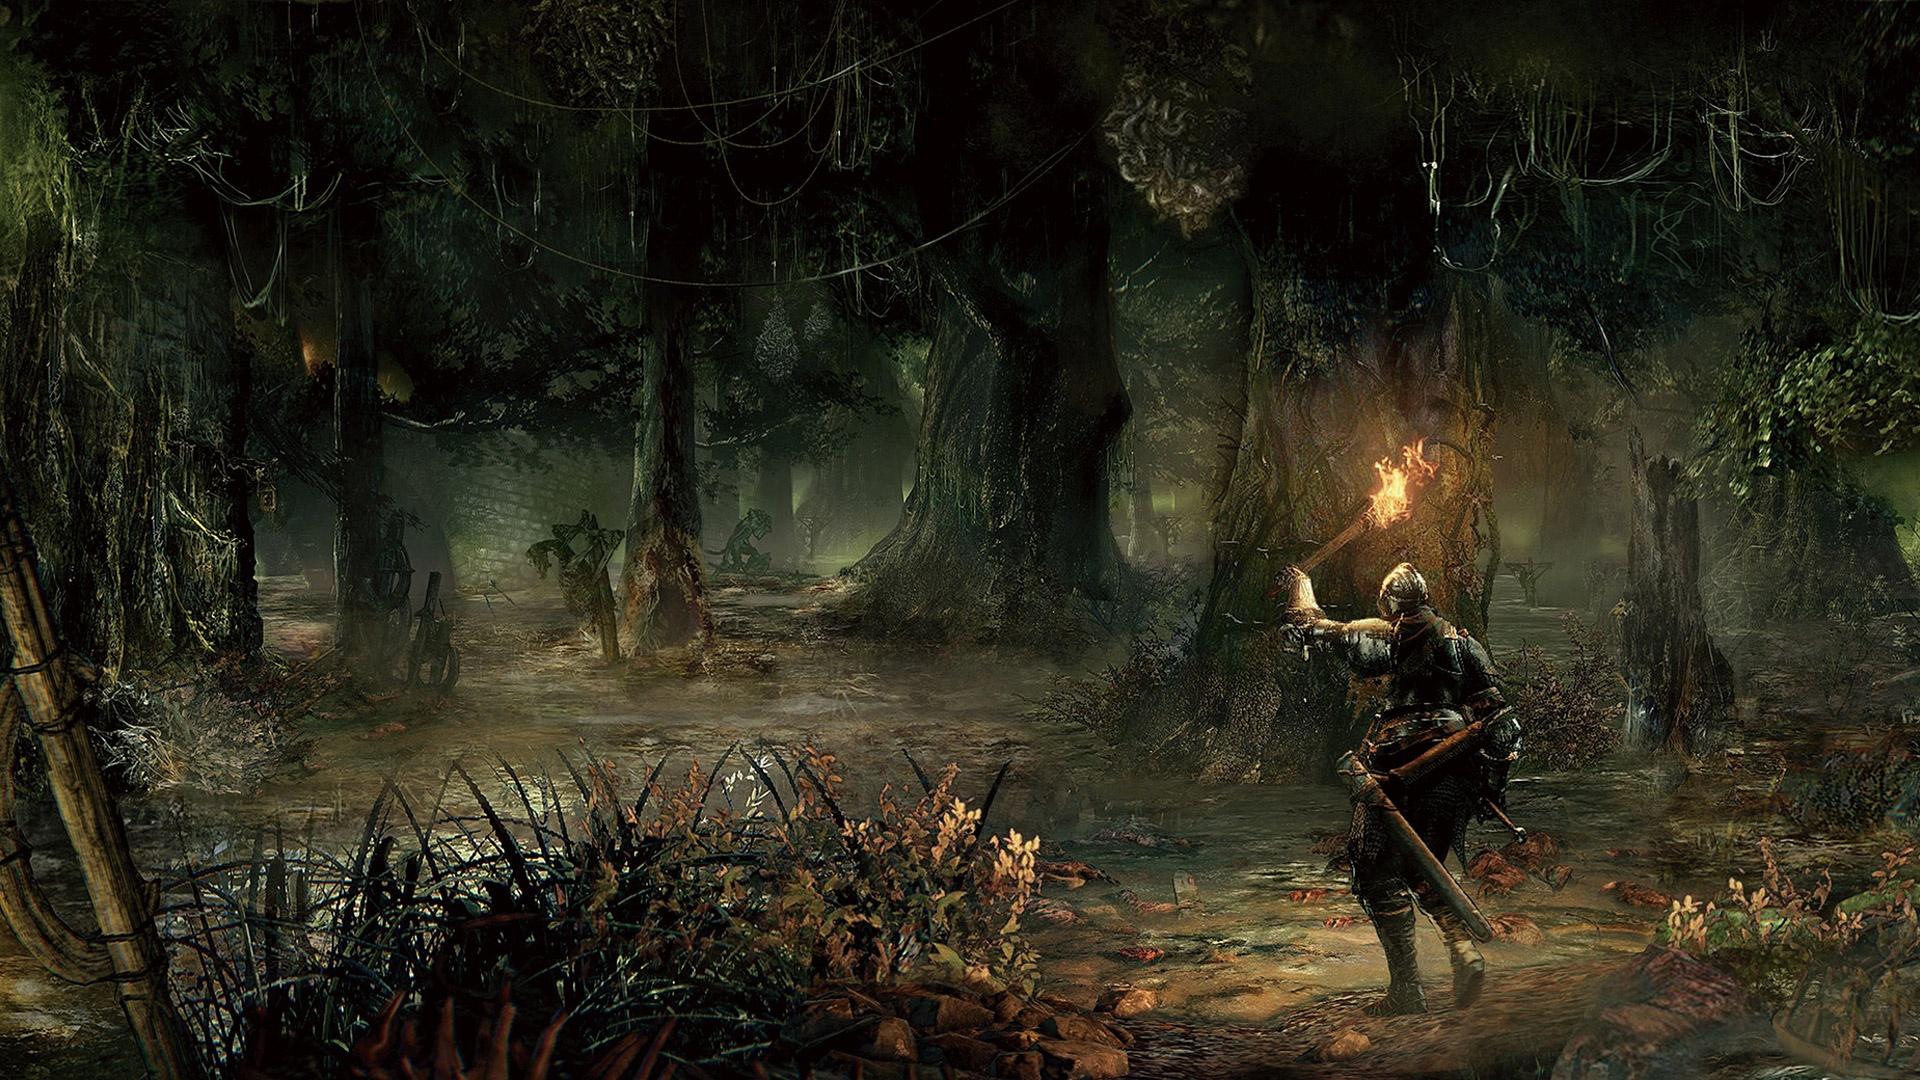 Dark Souls 3 computer wallpaper